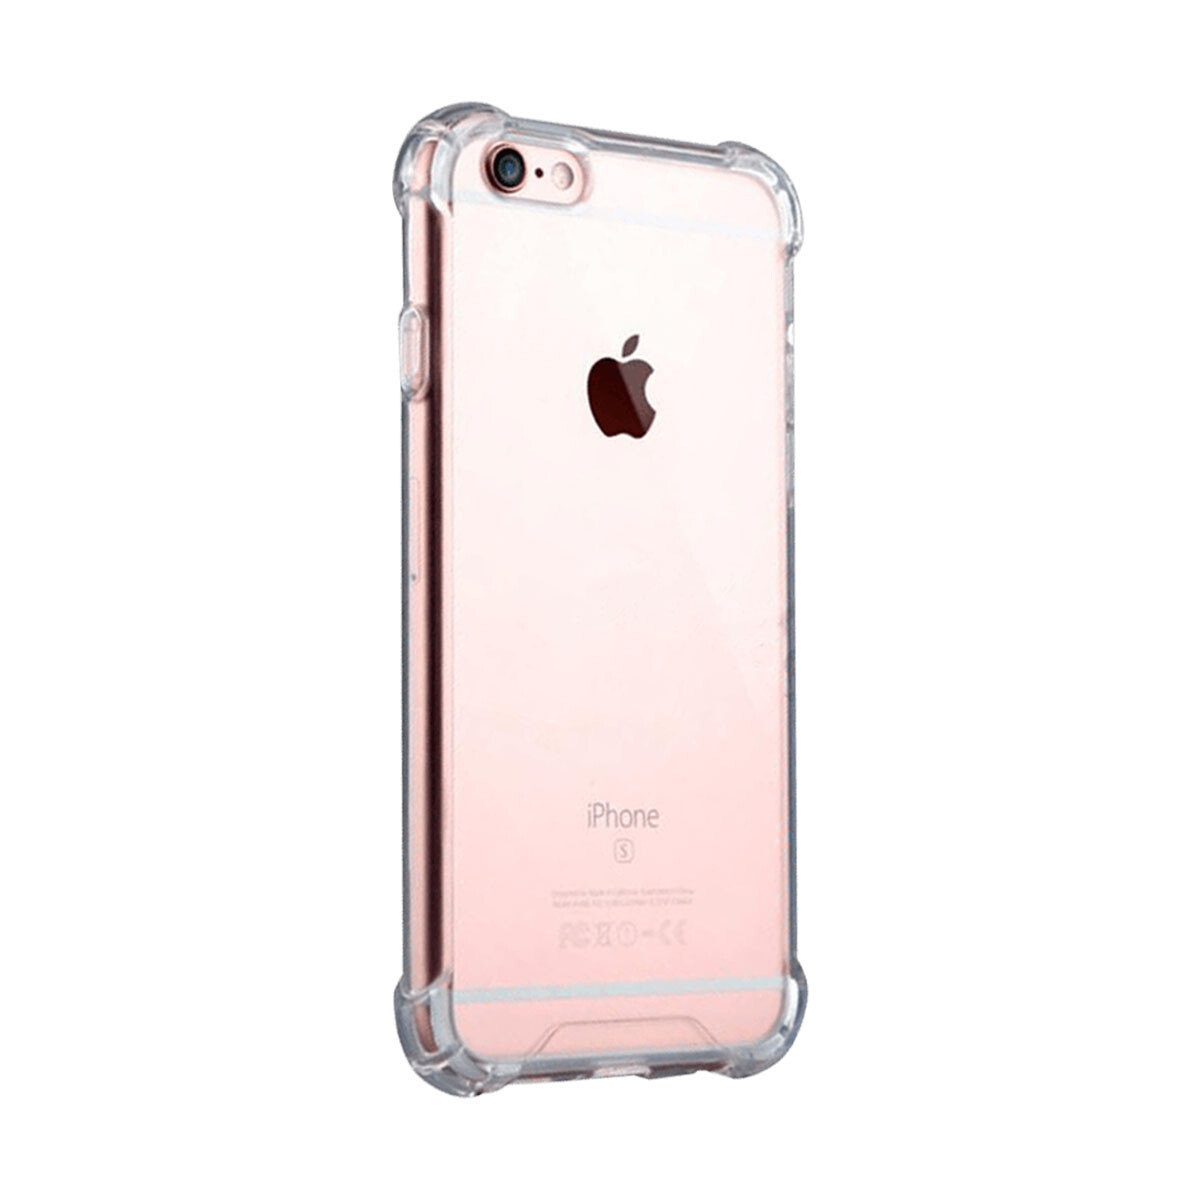 Estuche GEN Hard Case Reforzado  Transparente   Iphone 6